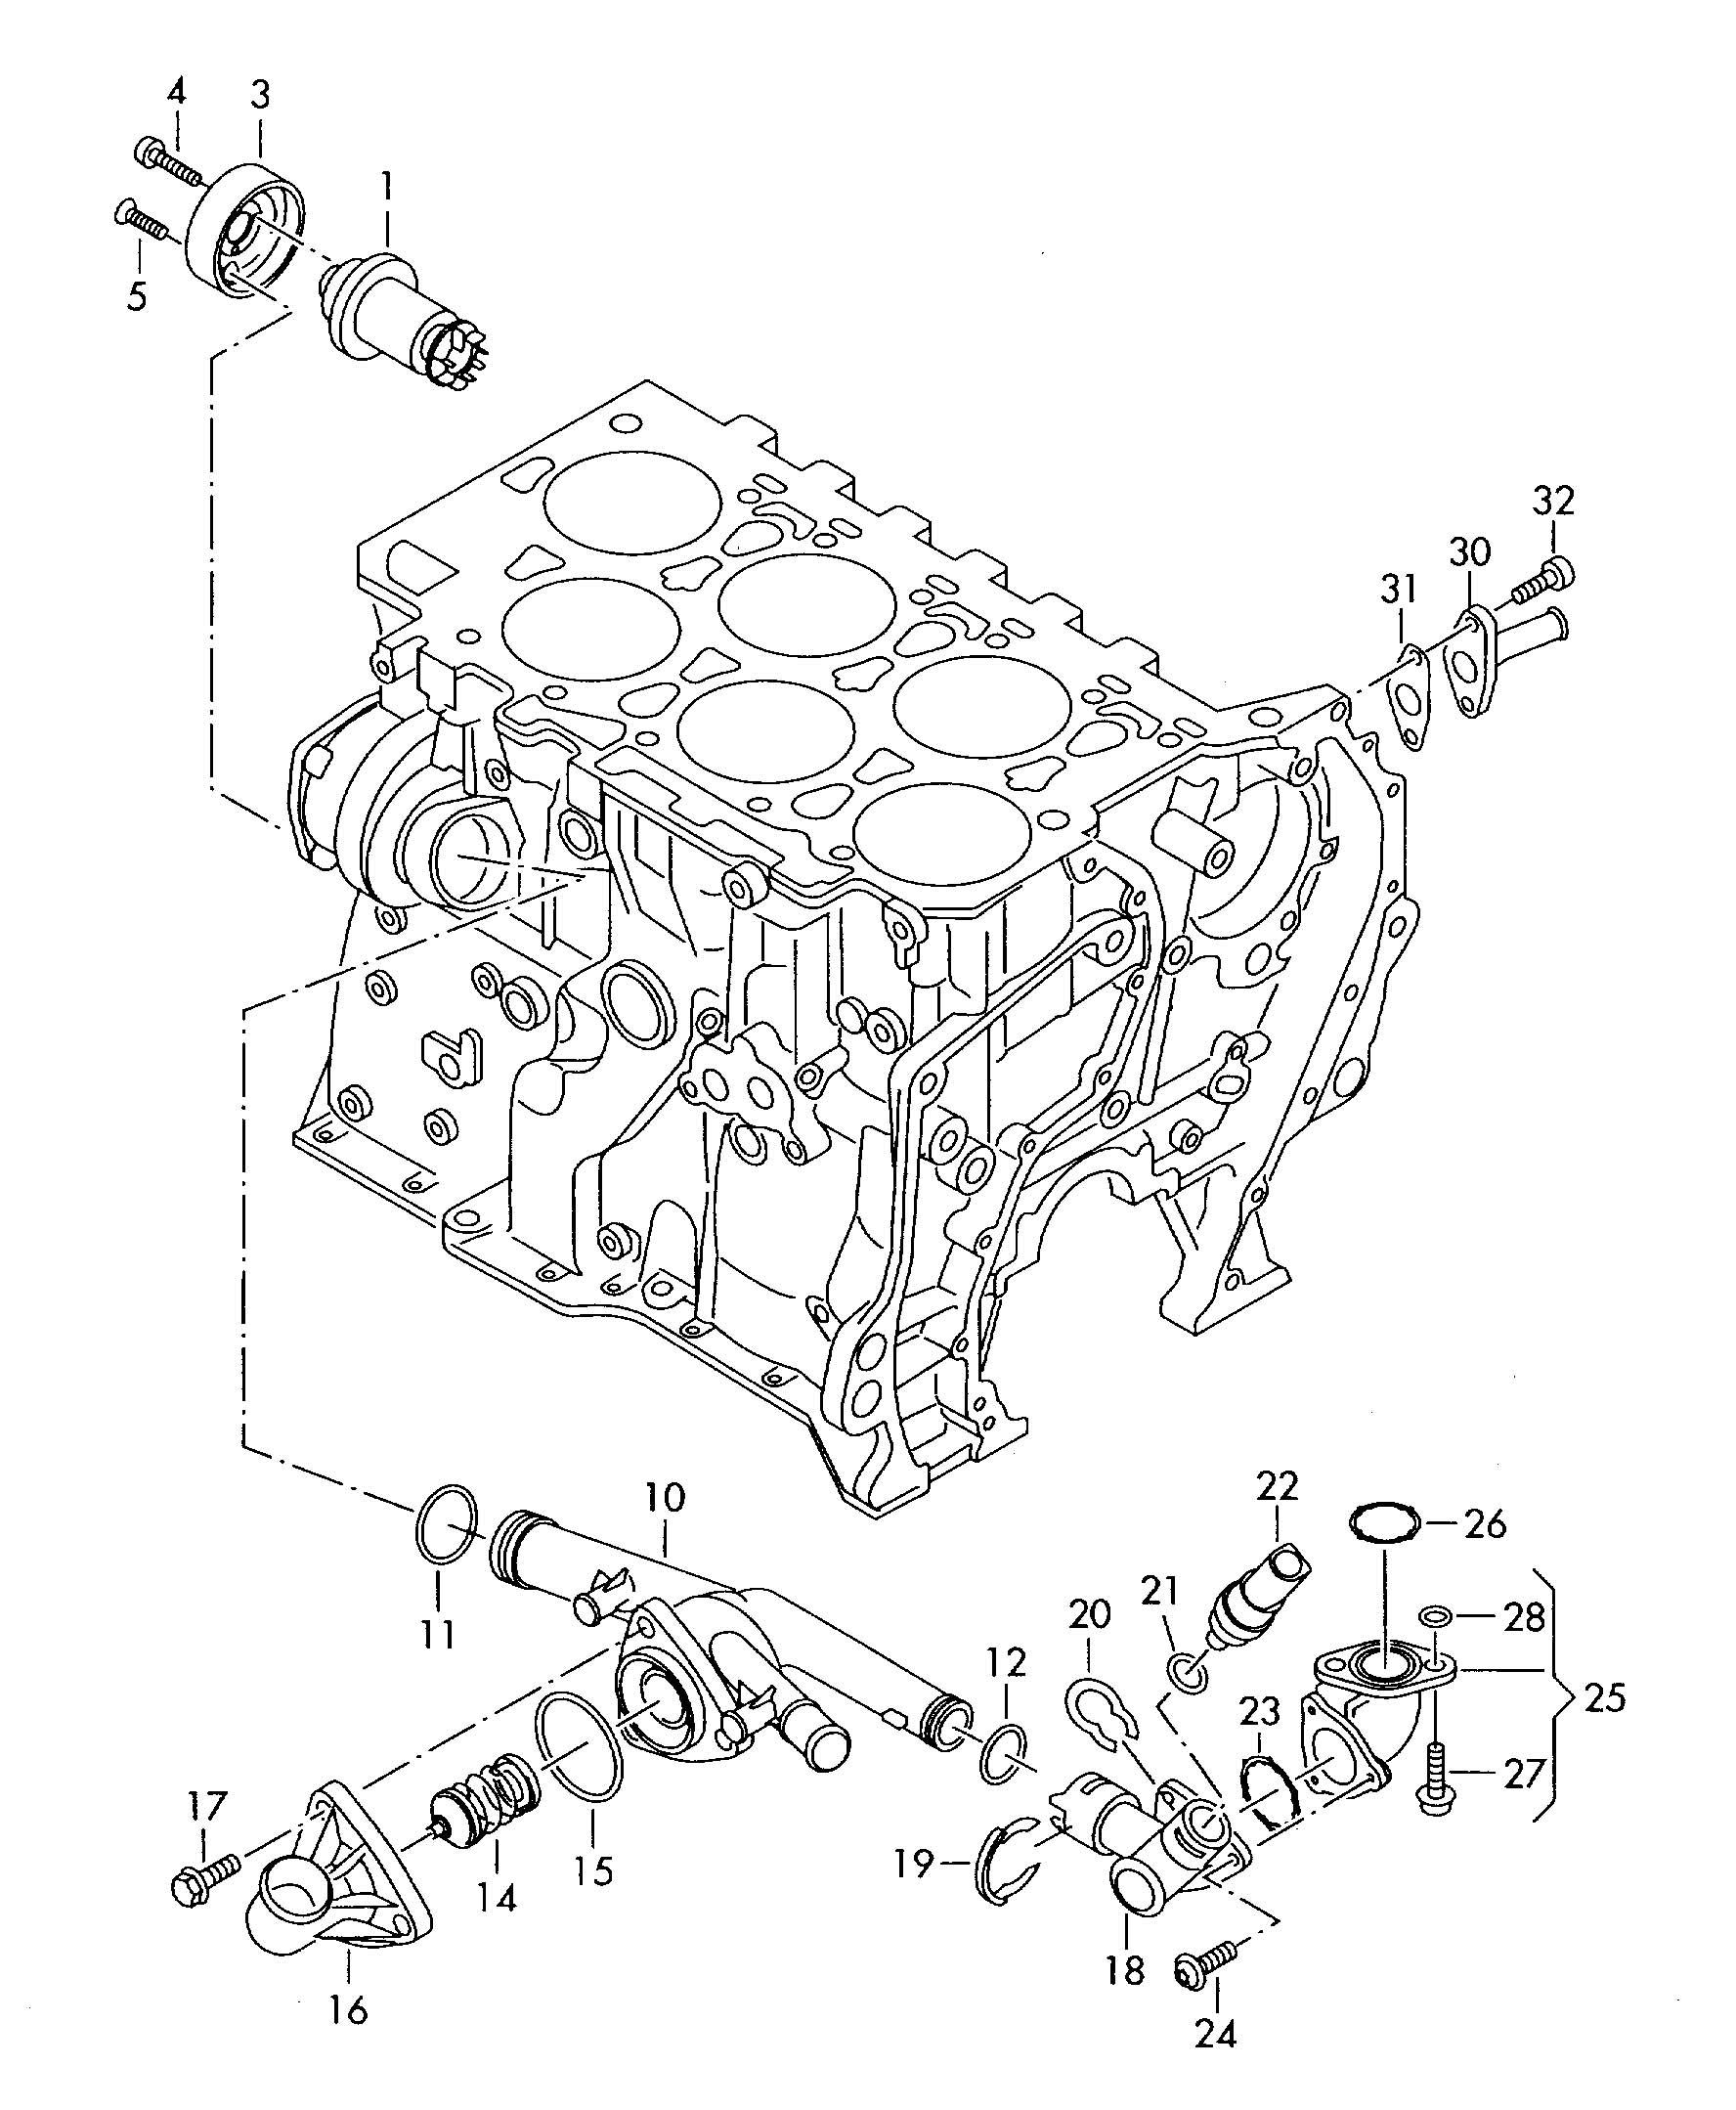 Volkswagen Touareg Adapter Pipe Support Bracket